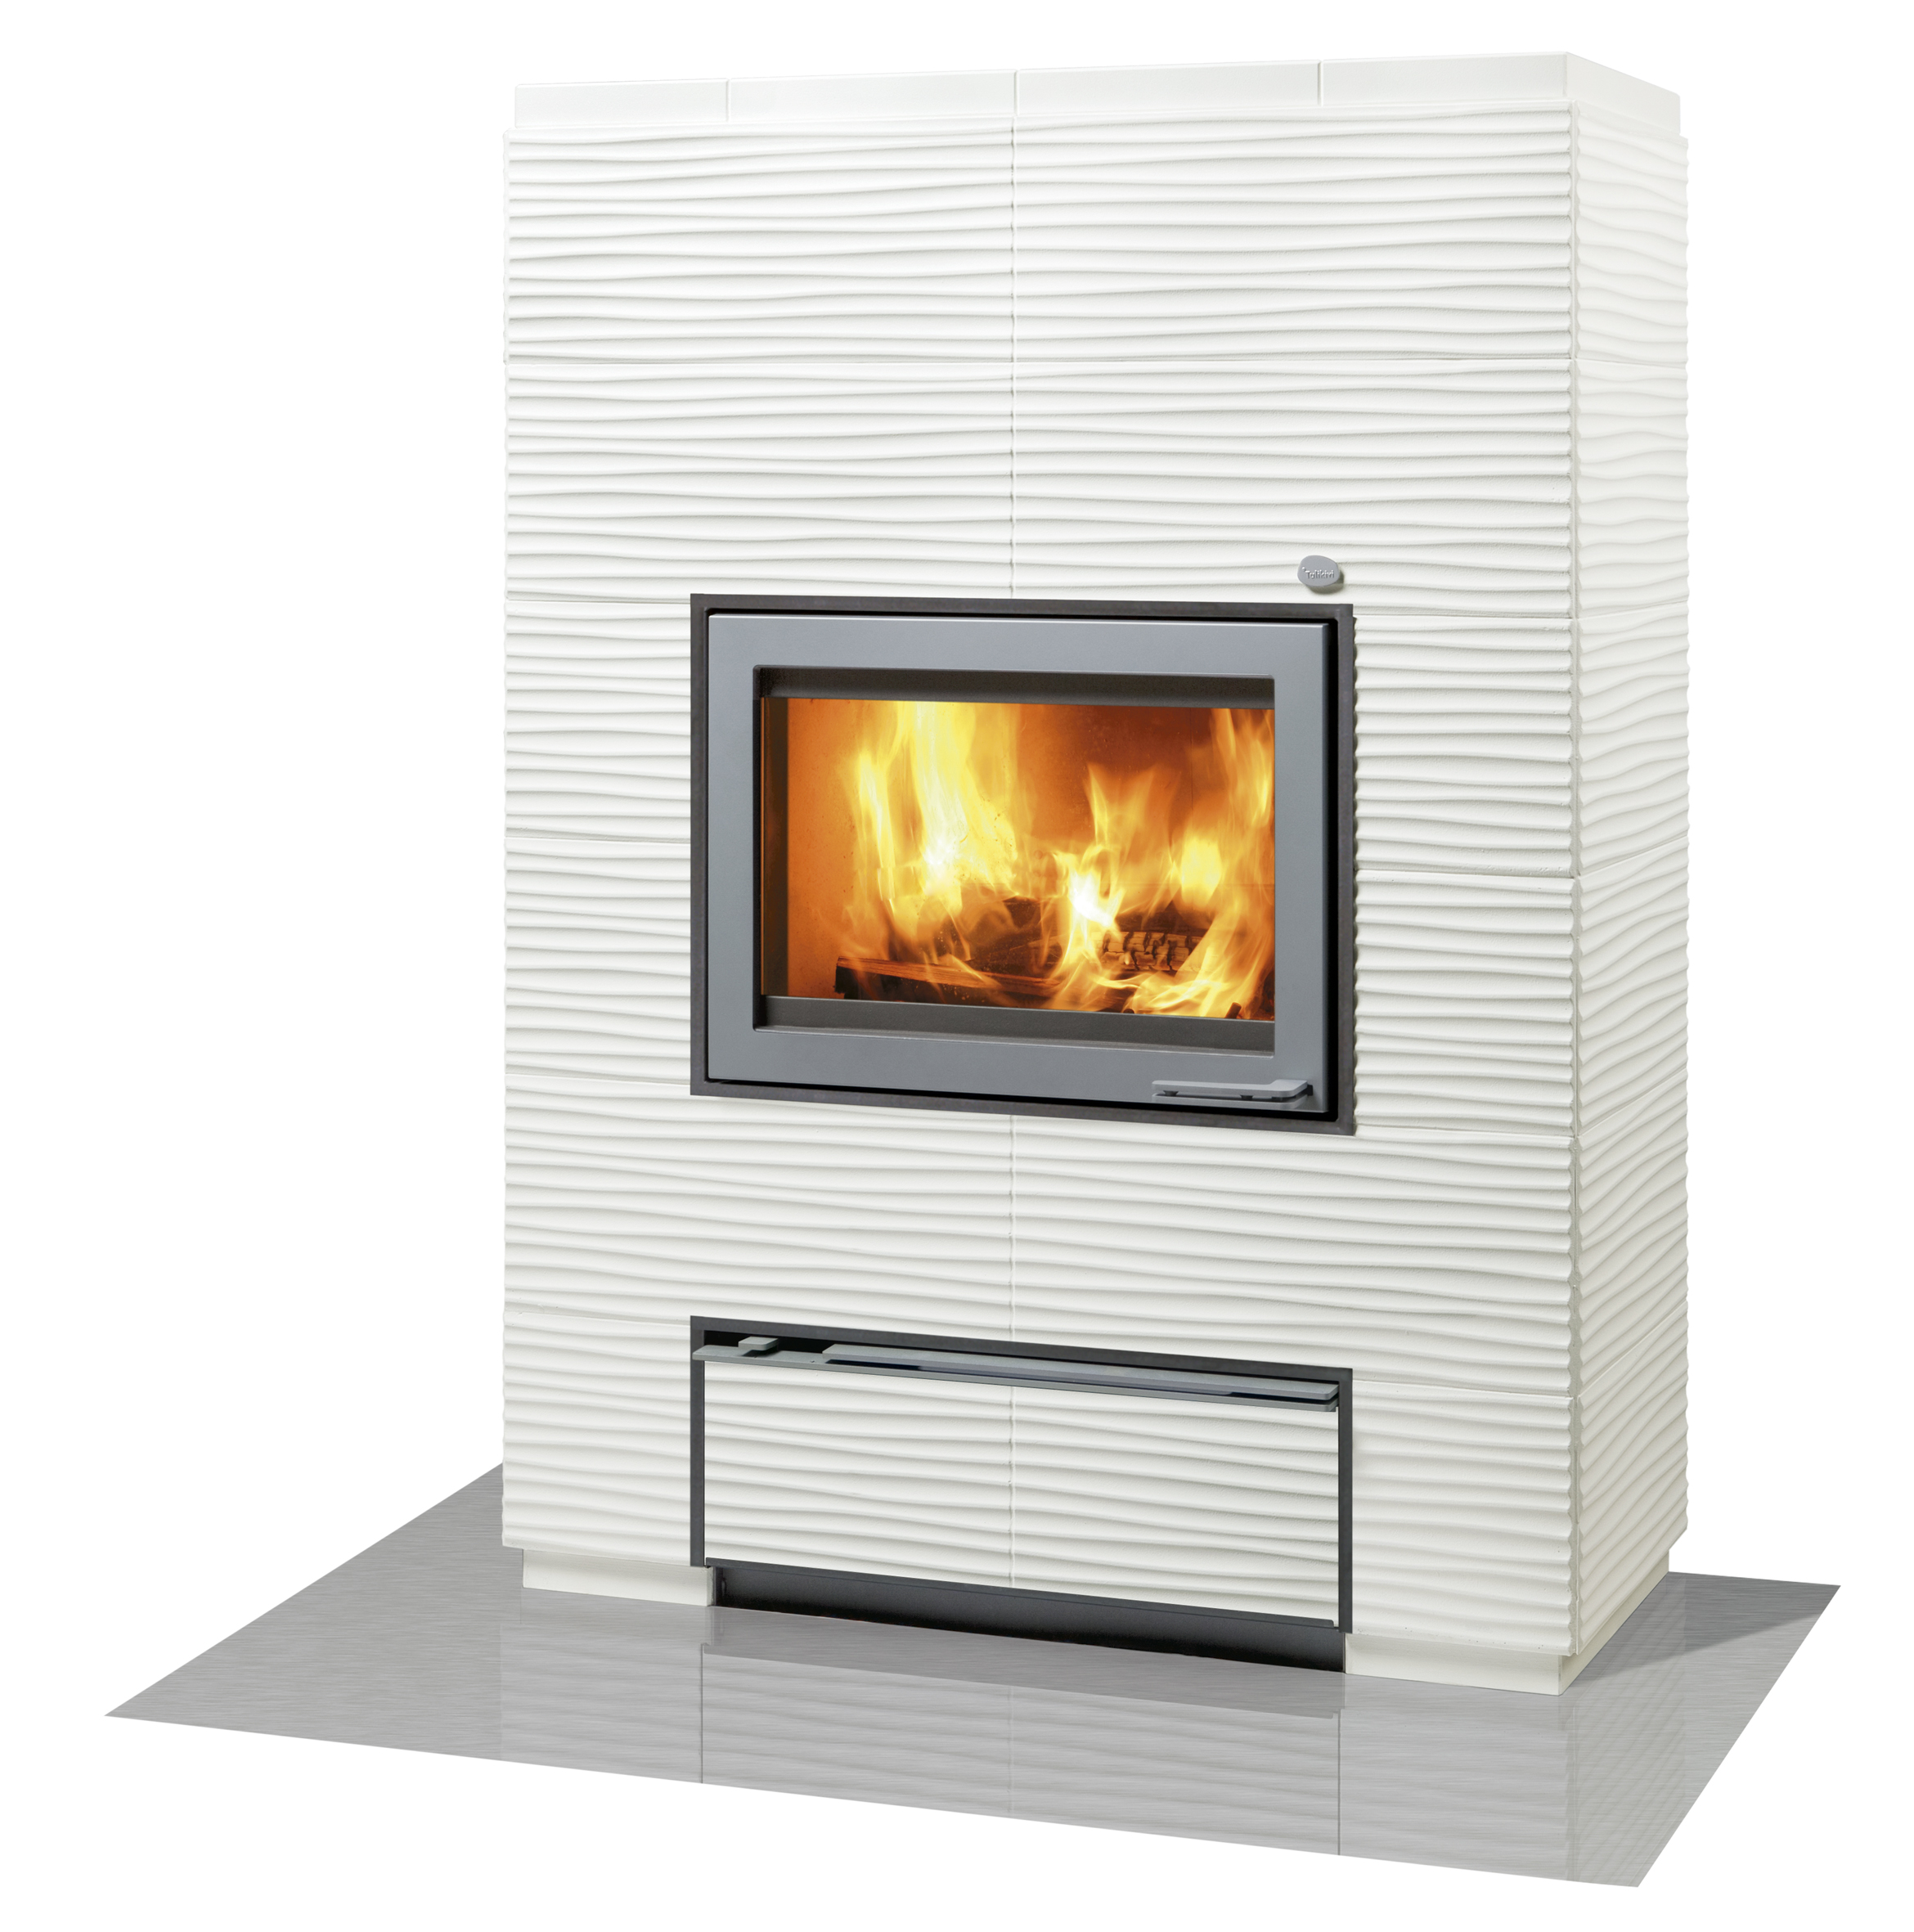 Tulikivi Hiisi 4 fireplace is made of soapstone Tulikivi s